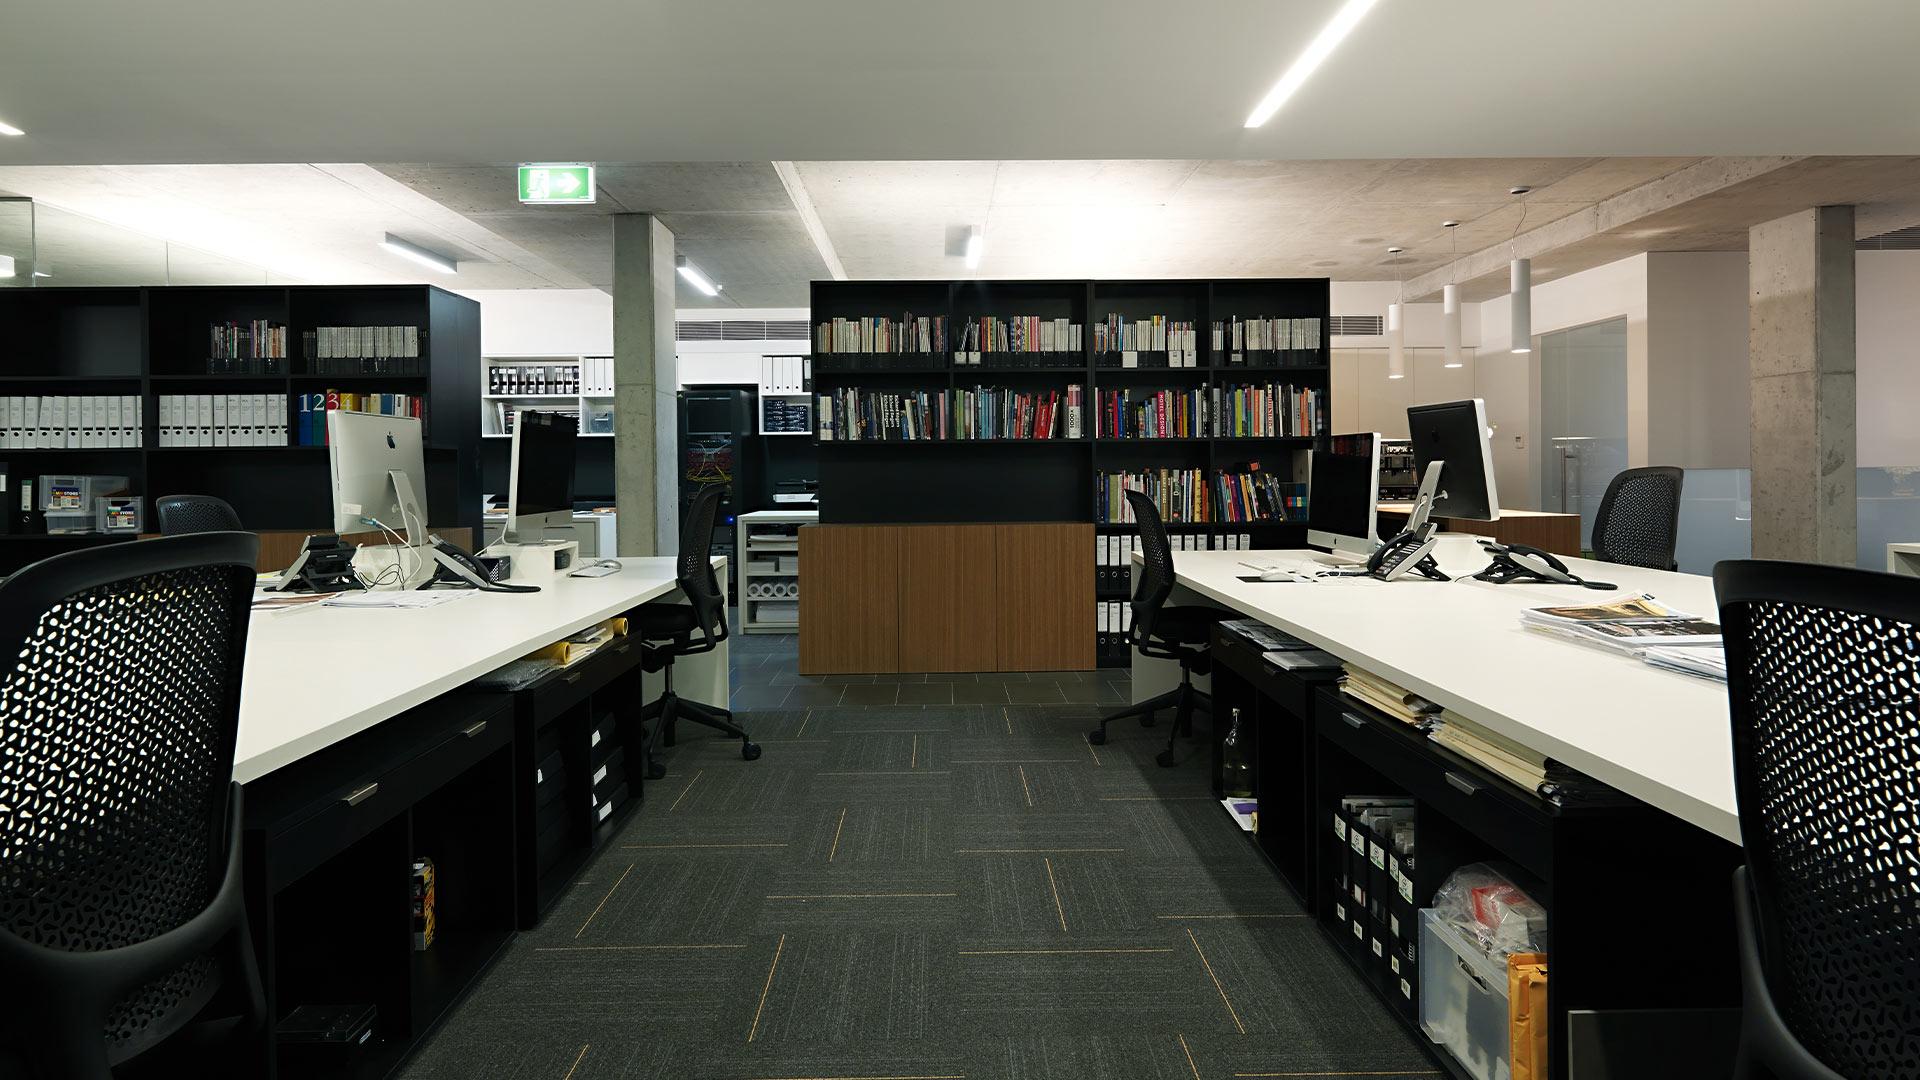 https://jamarchitects.com.au/wp-content/uploads/2021/08/JAM-Projects-JAMRichmond12-1920x1080-1.jpg